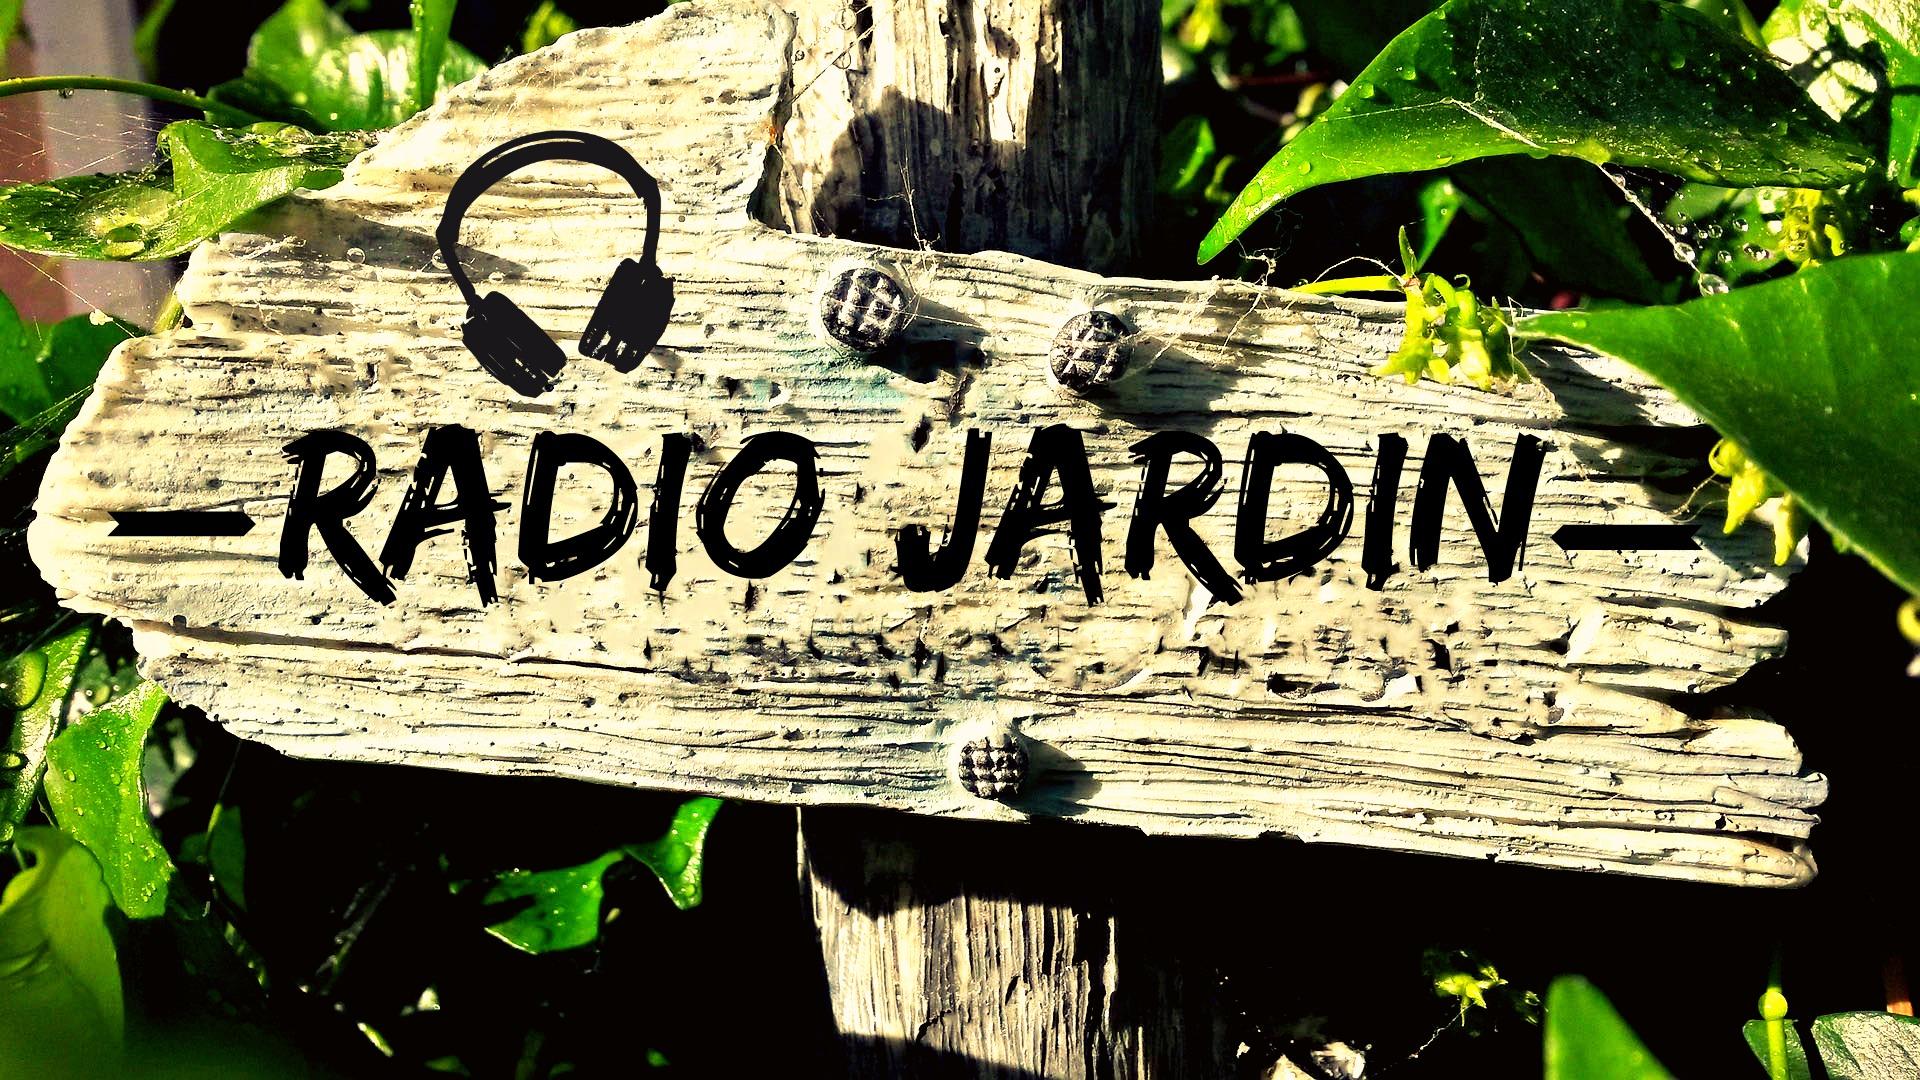 Radio Jardin du 16.05.2017